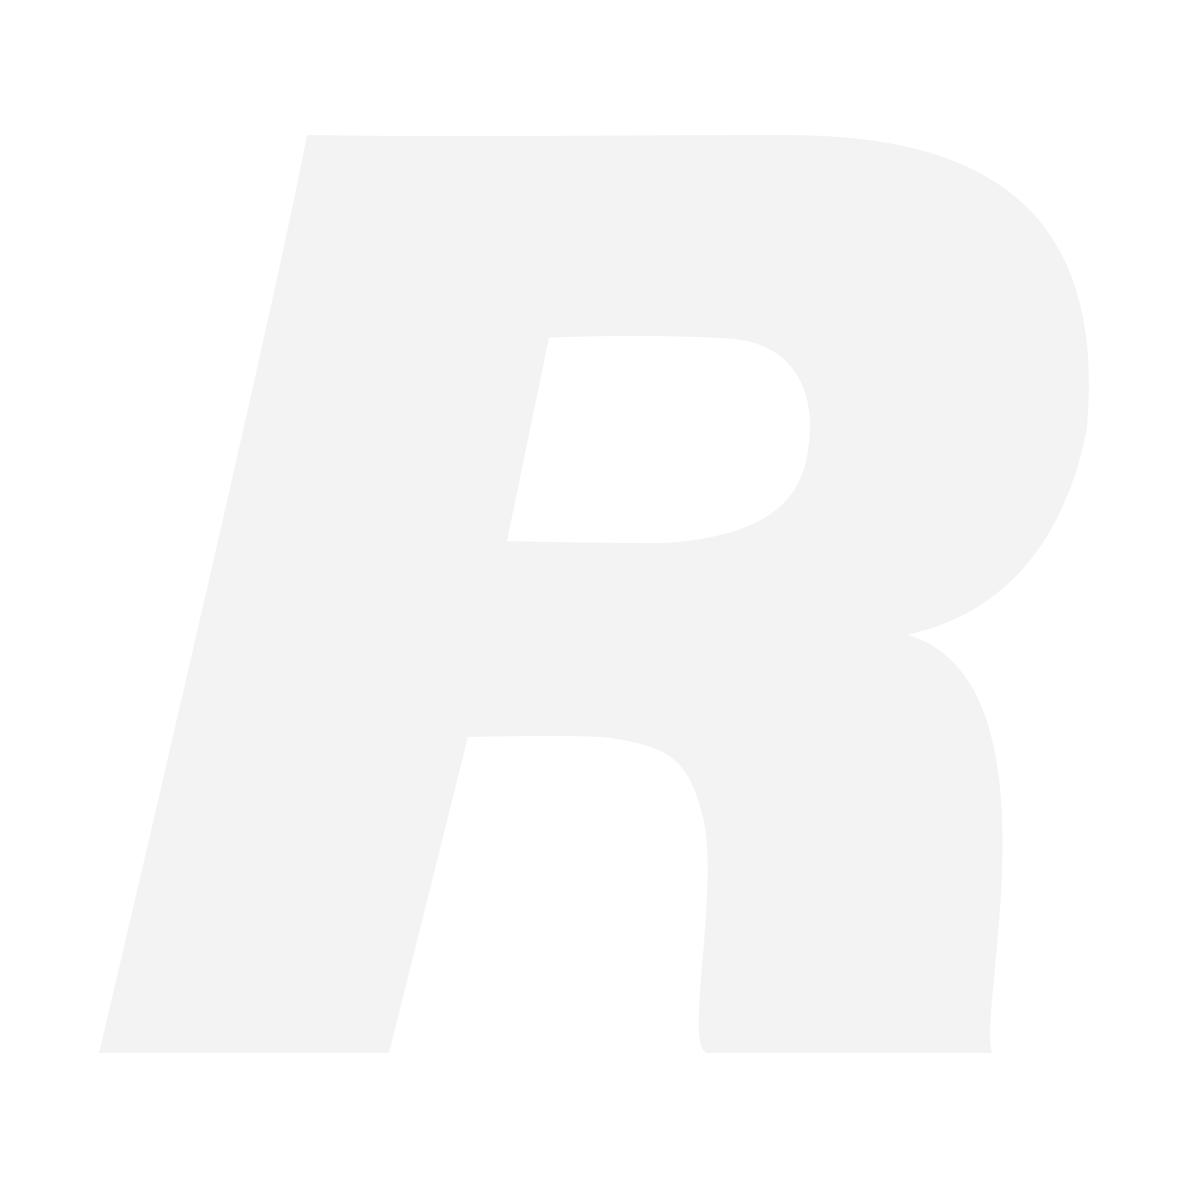 Osta Sony A7R Mark III -järjestelmäkamera, anna vaihdossa Sony A7R